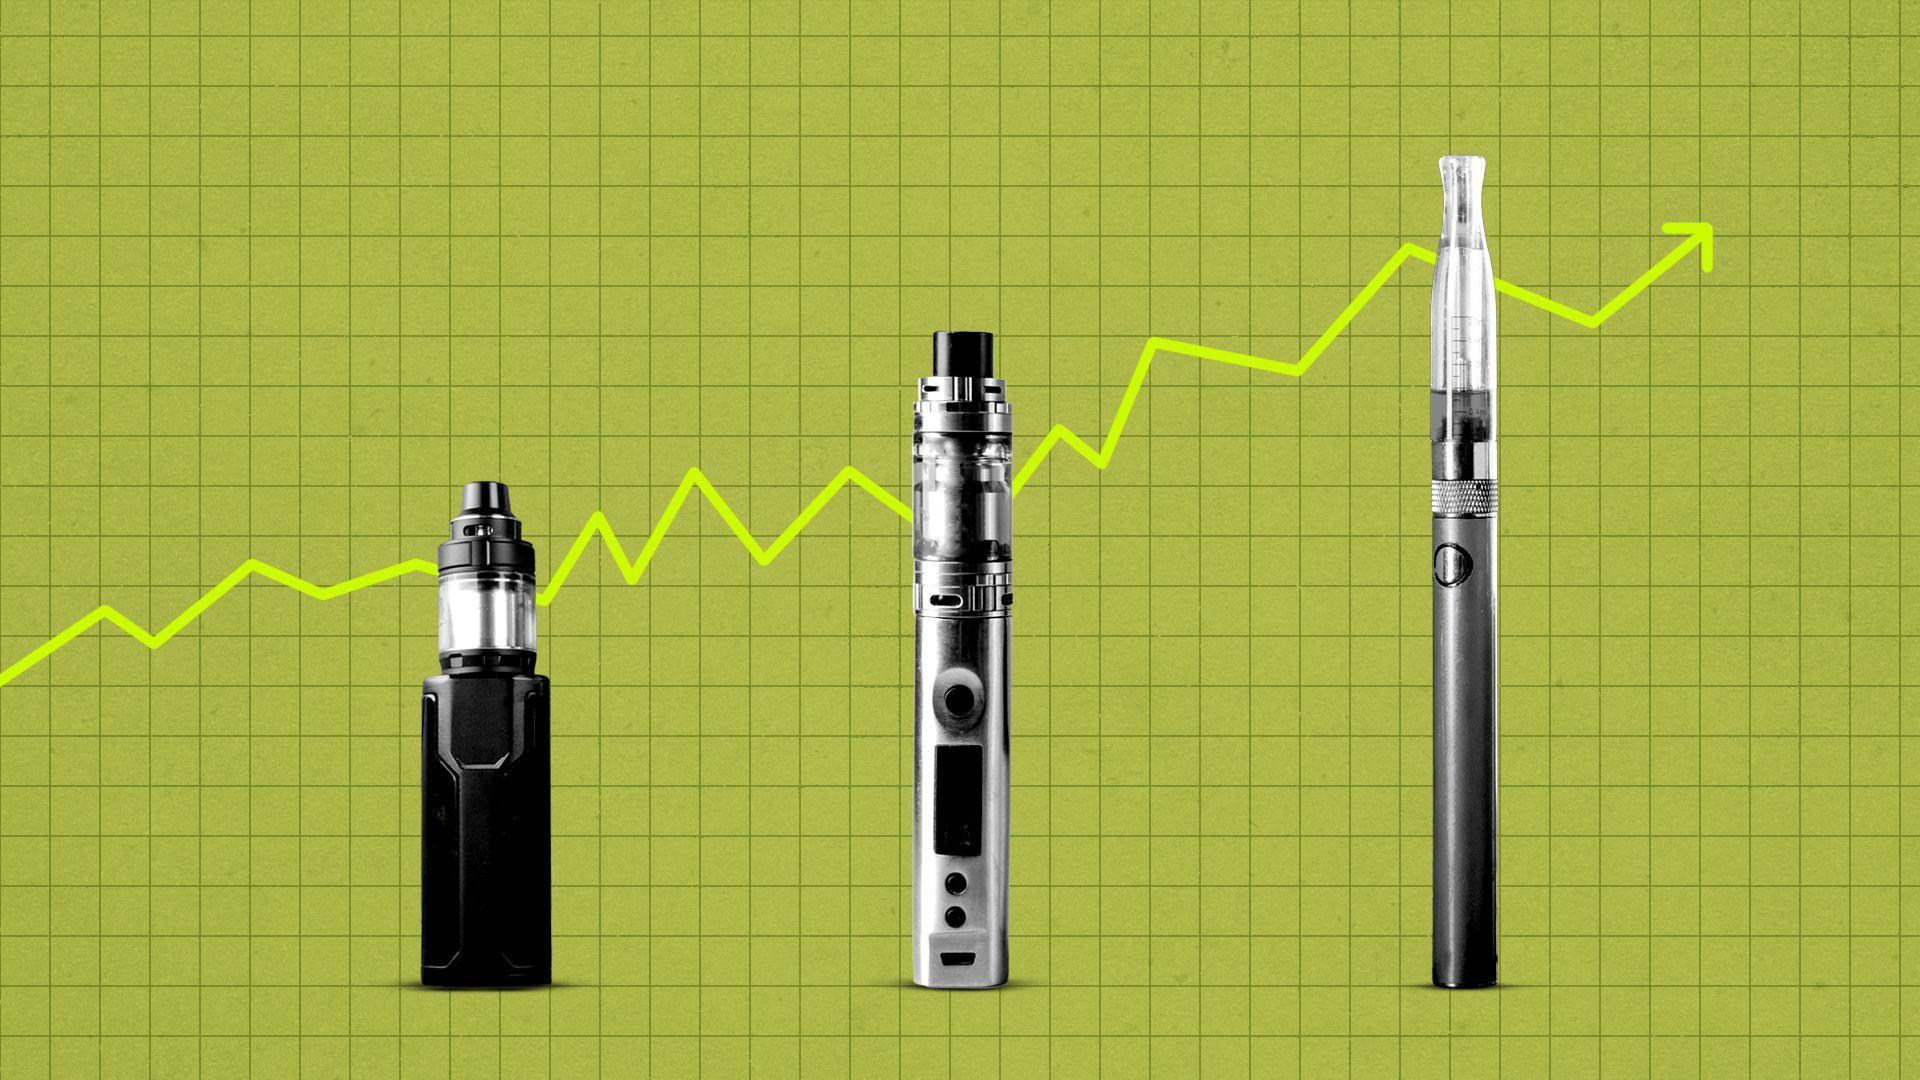 Illustration of three vape pens in front of an upward trending graph.